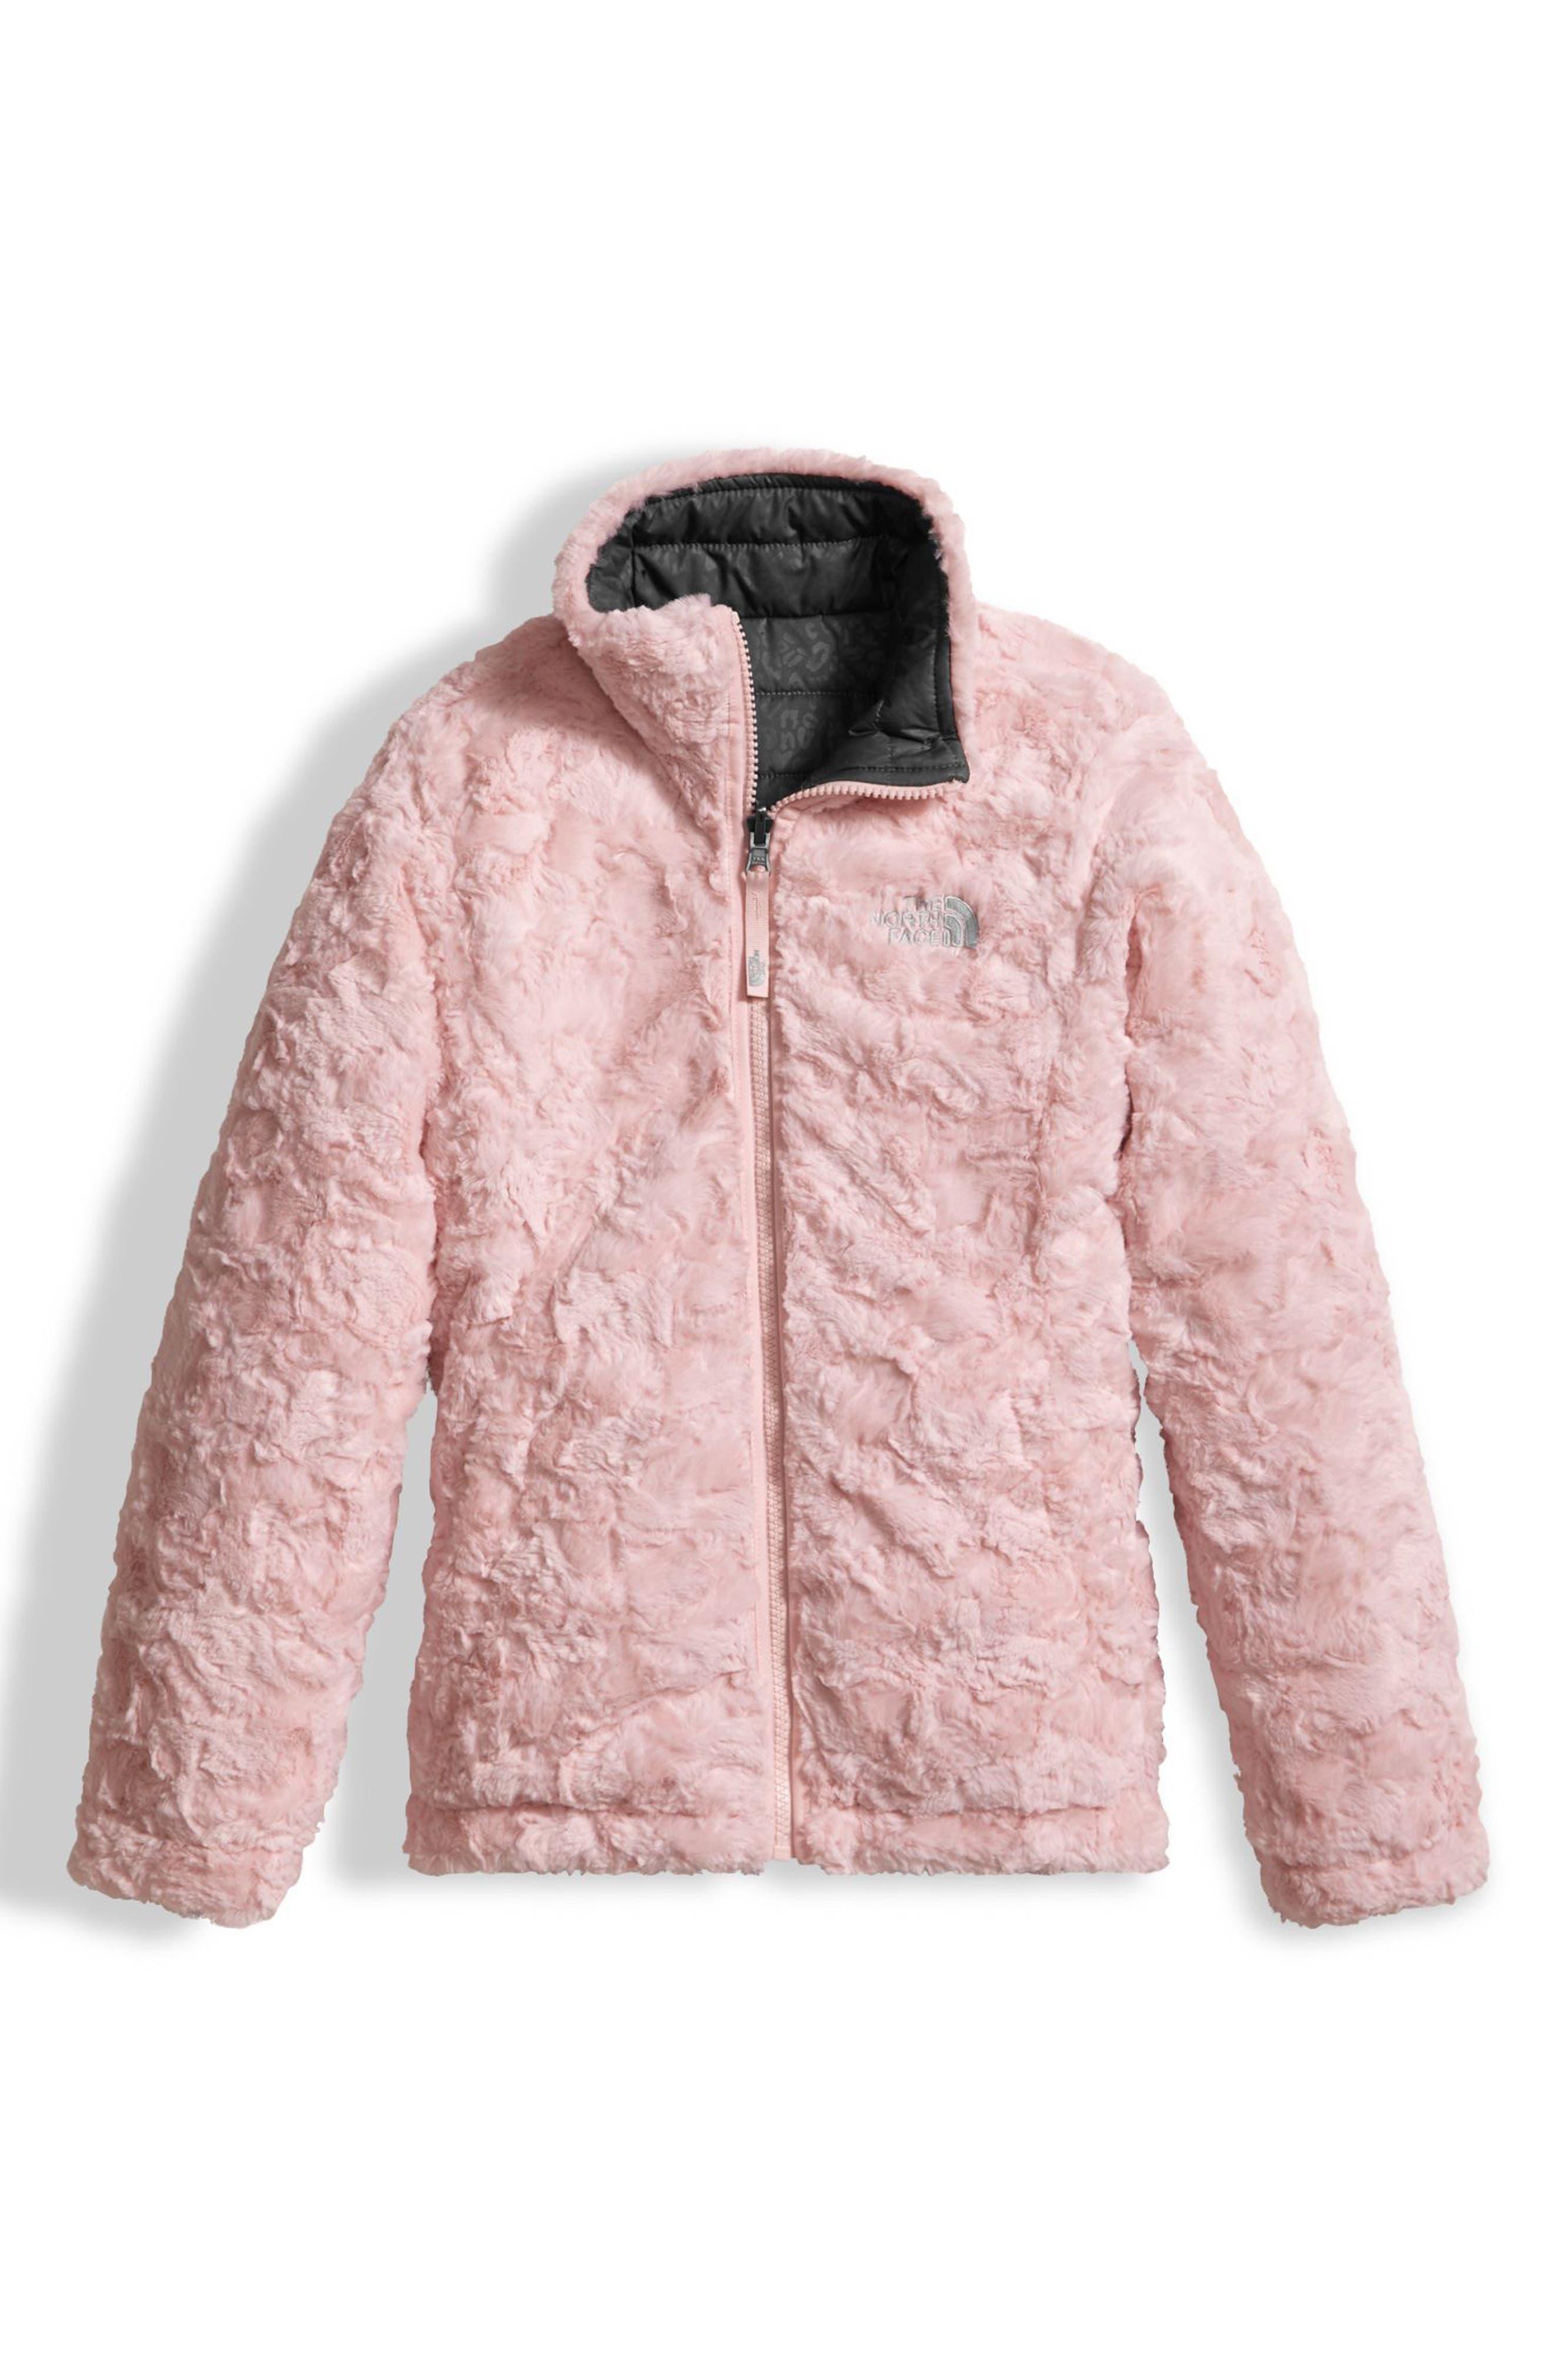 Mossbud Reversible Heatseeker<sup>™</sup> Wind Resistant Jacket,                             Alternate thumbnail 2, color,                             Graphite Grey